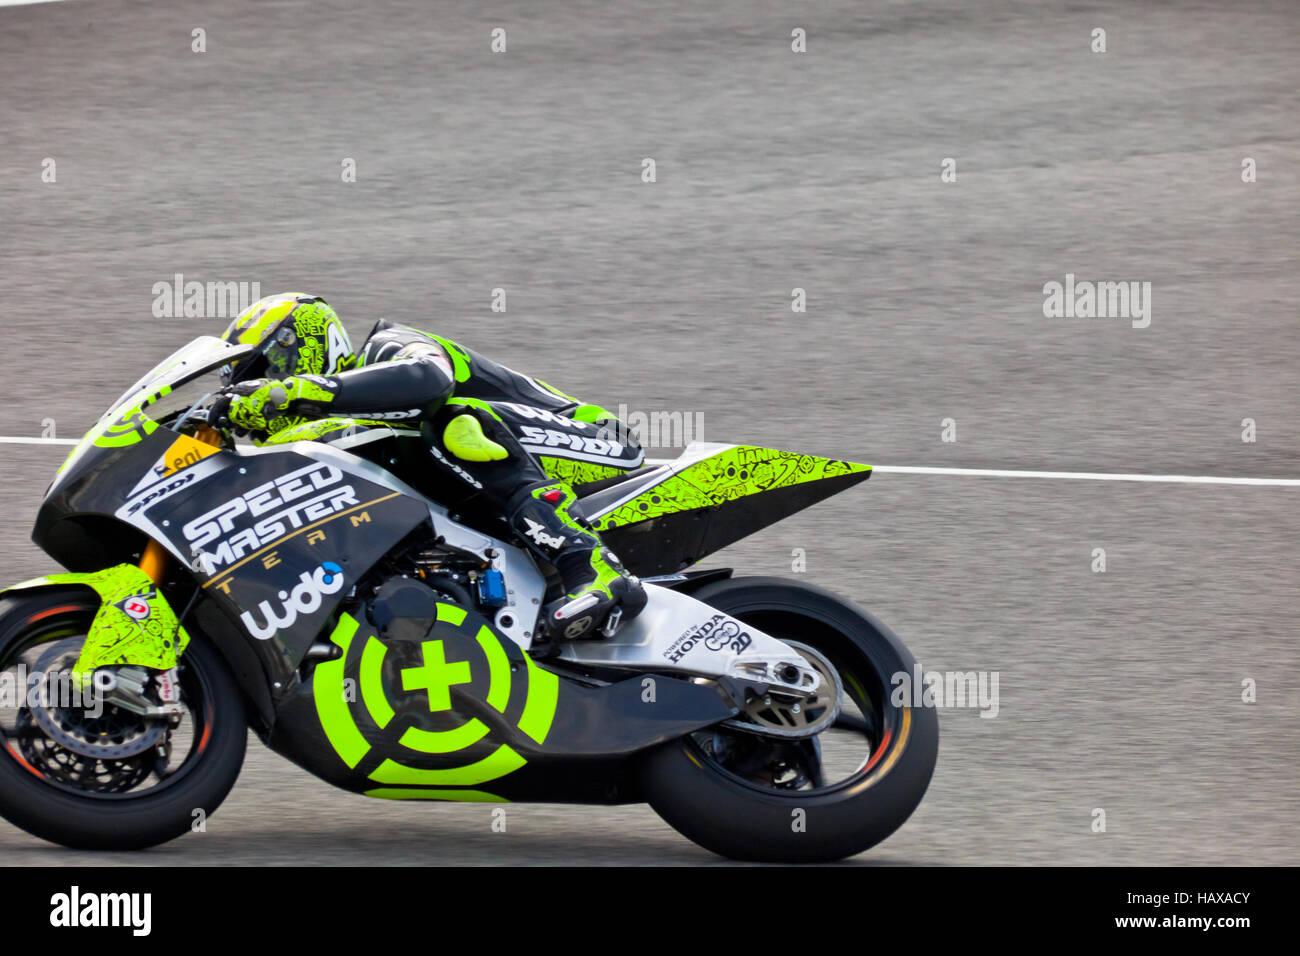 Andrea Iannone pilot of Moto2 in the MotoGP - Stock Image